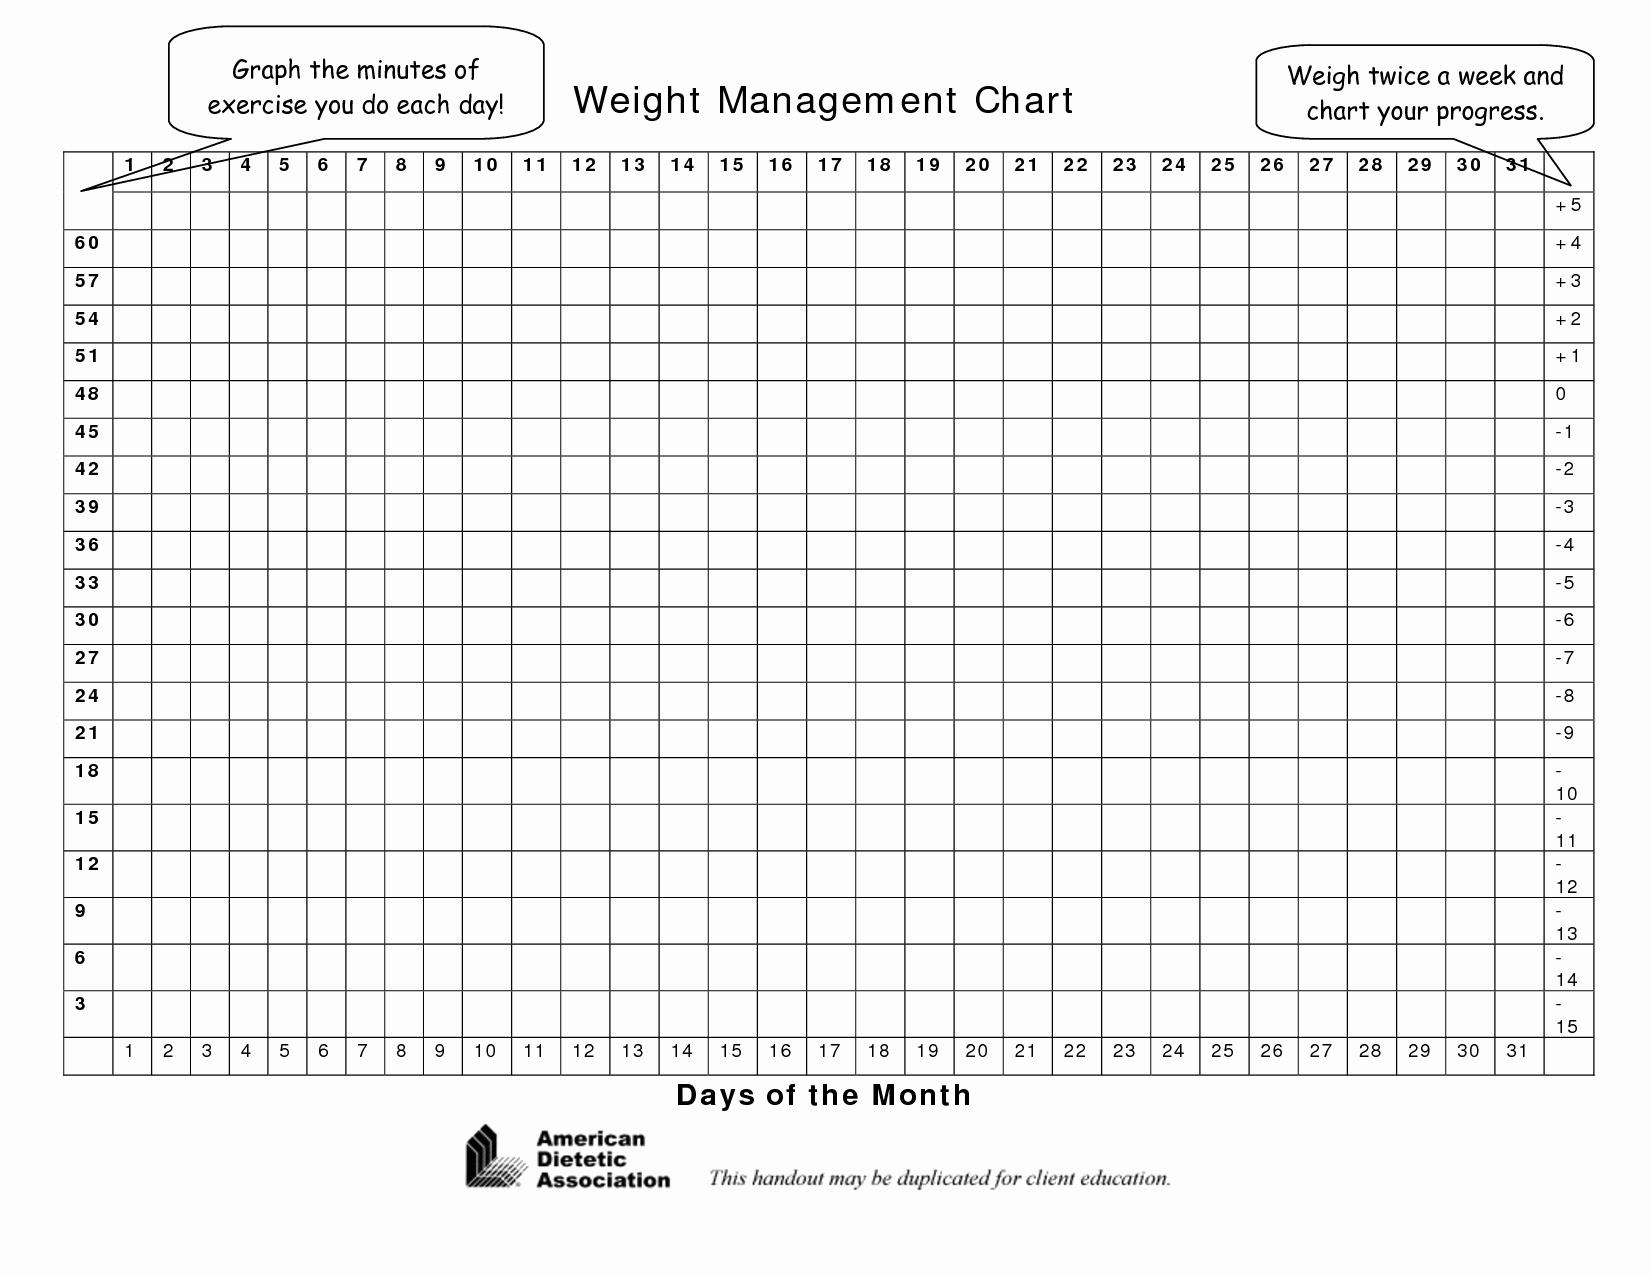 Printable Weight Loss Graph | Ellipsis - Printable Weight Loss Charts Free